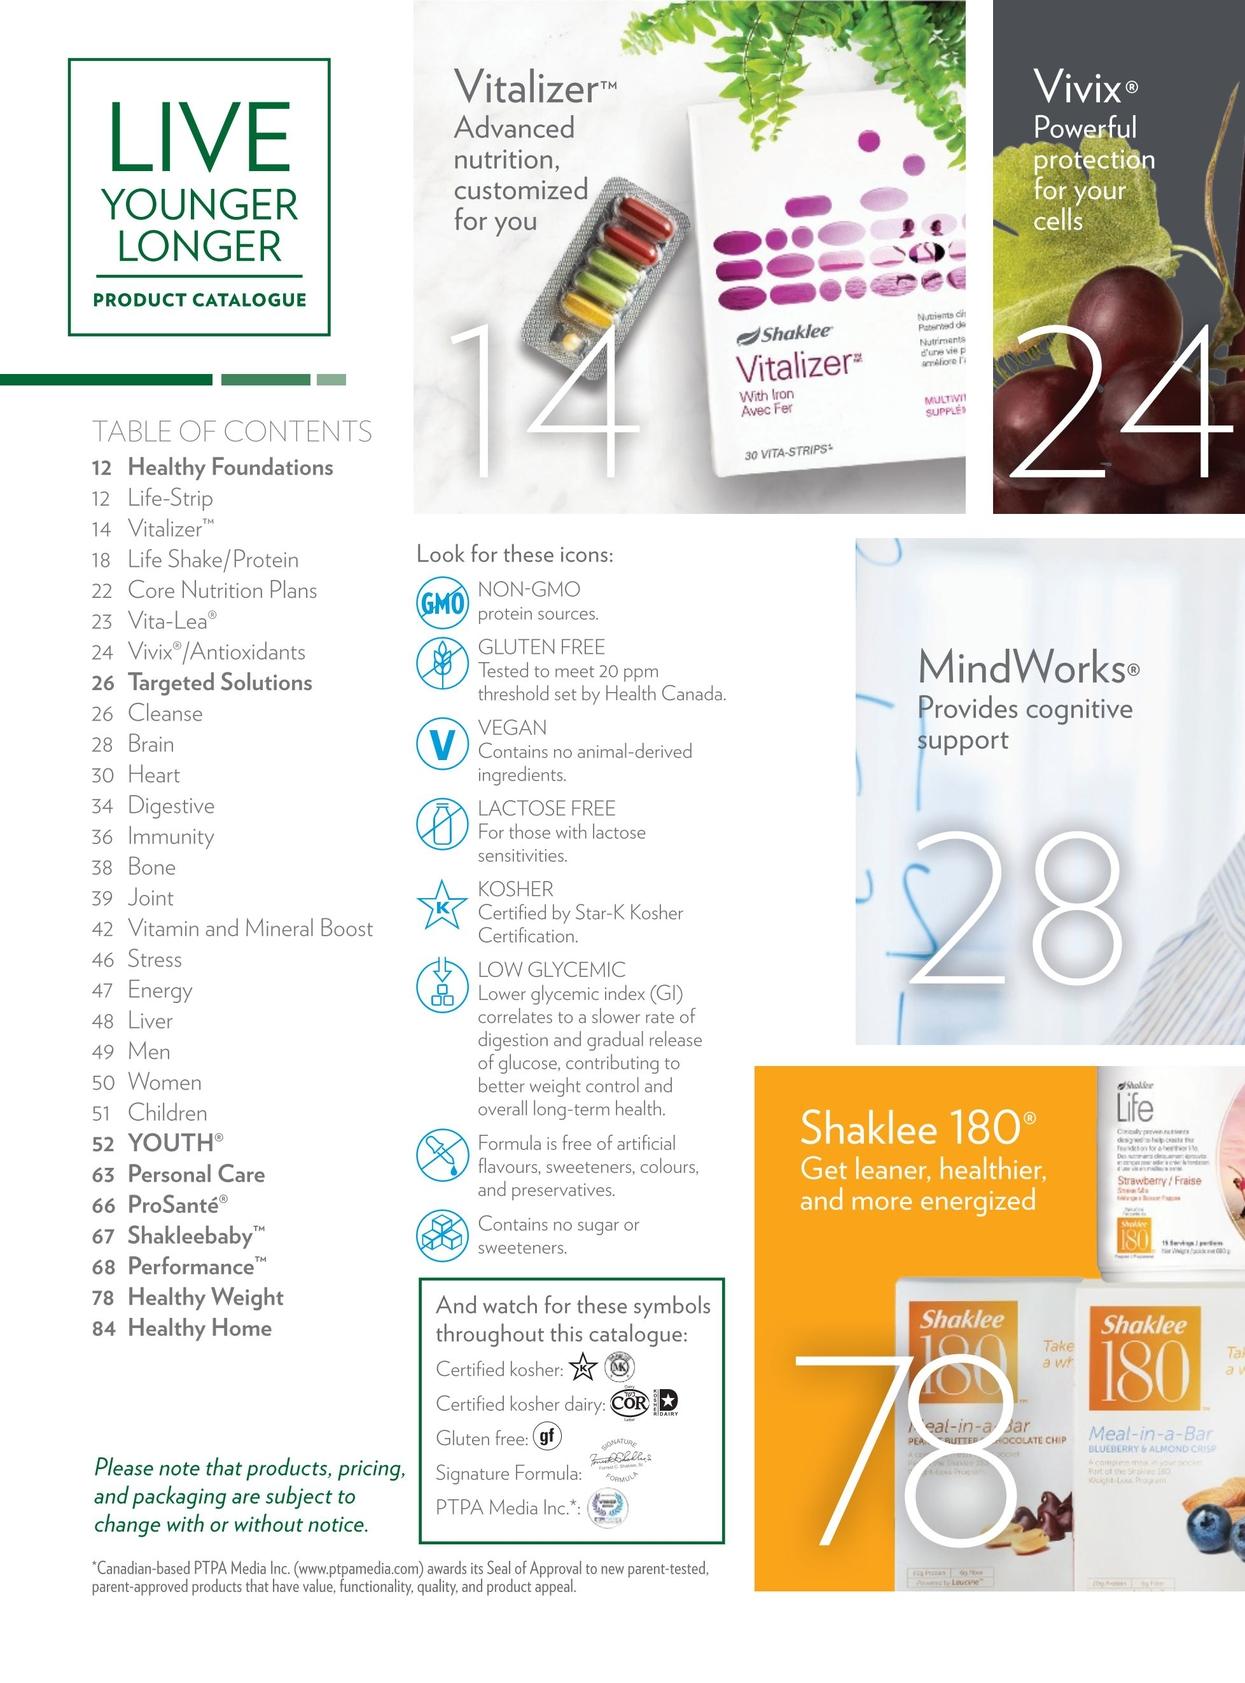 Shaklee Product Catalogue 2018 Canadaenglish